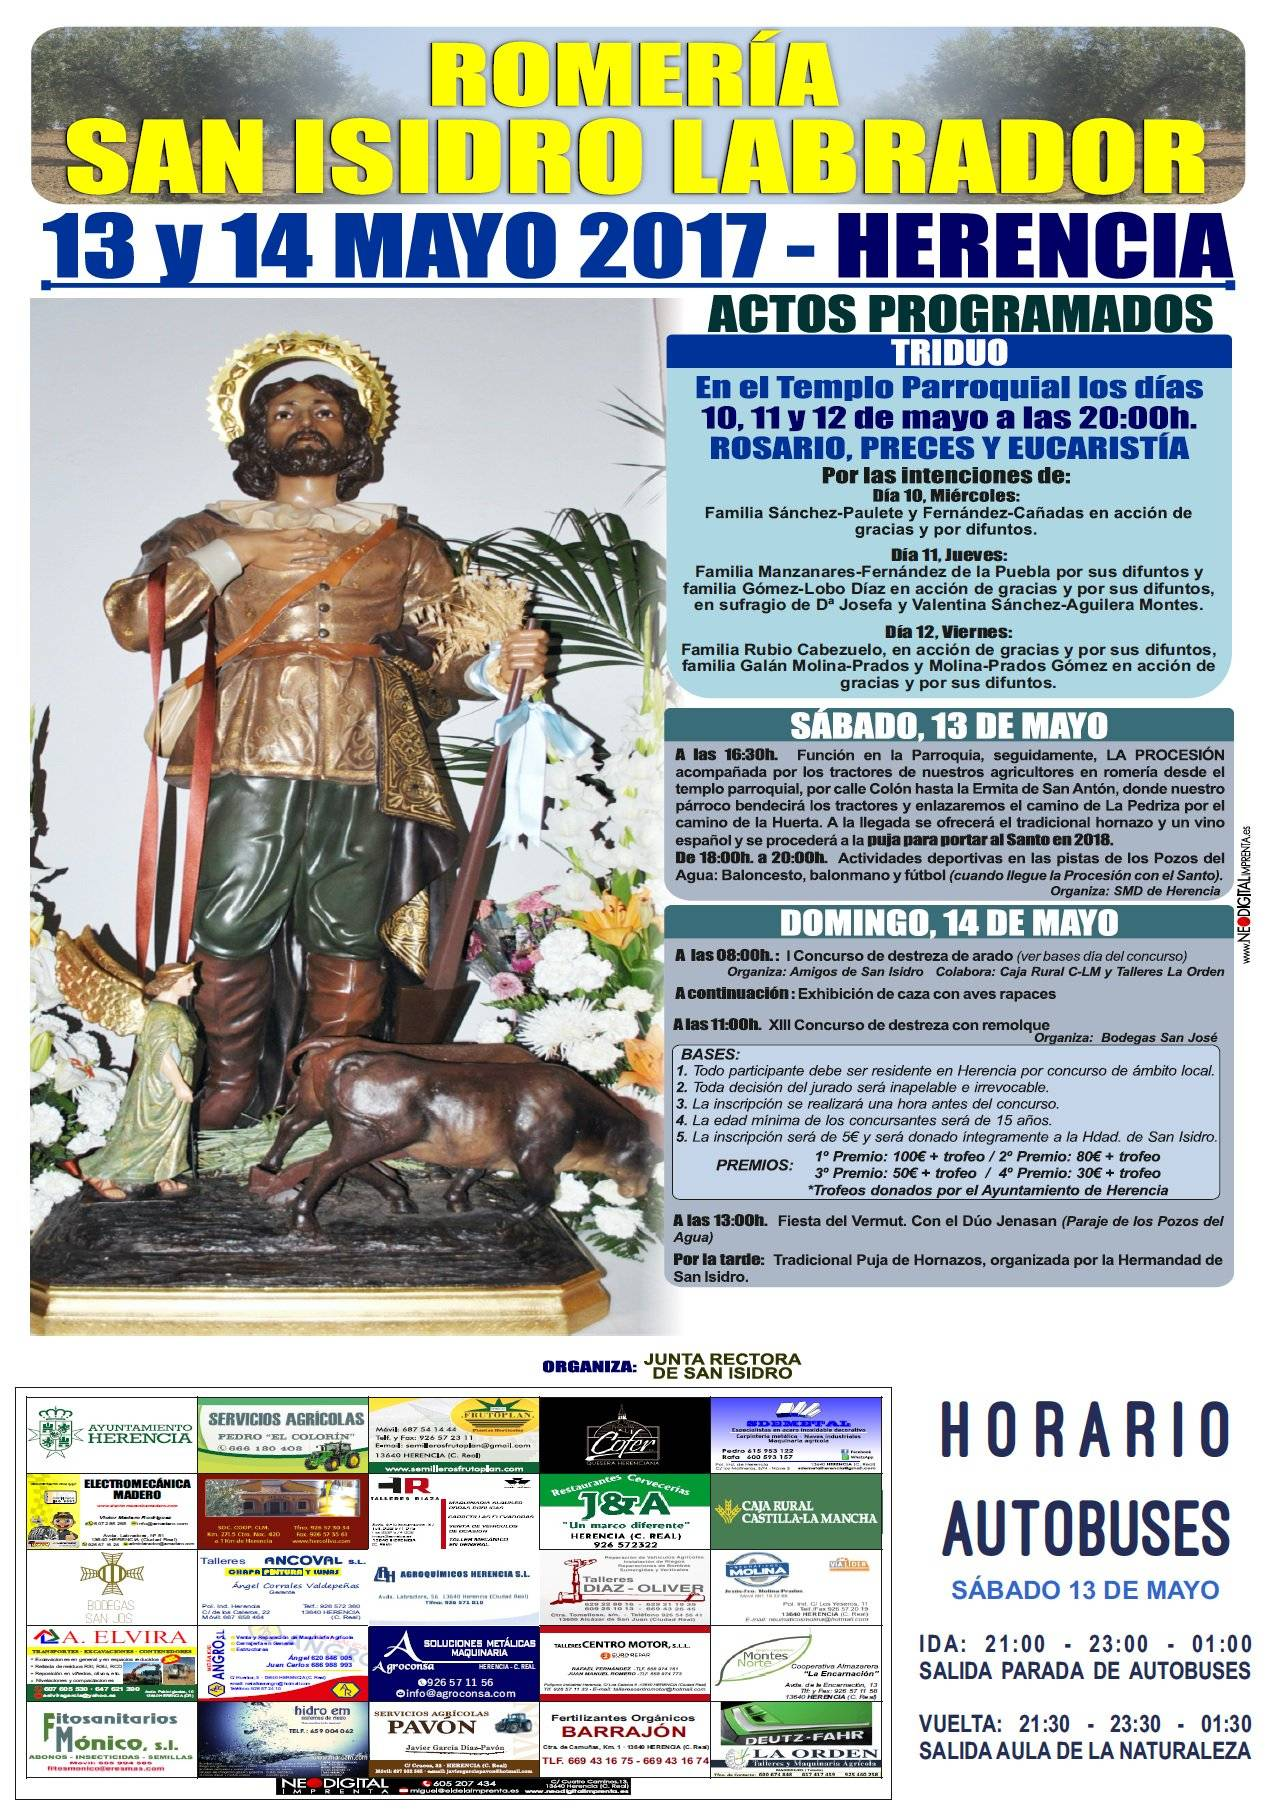 romeria san isidro labrador herencia grande - Este sábado se celebra la tradicional Romería de San Isidro Labrador